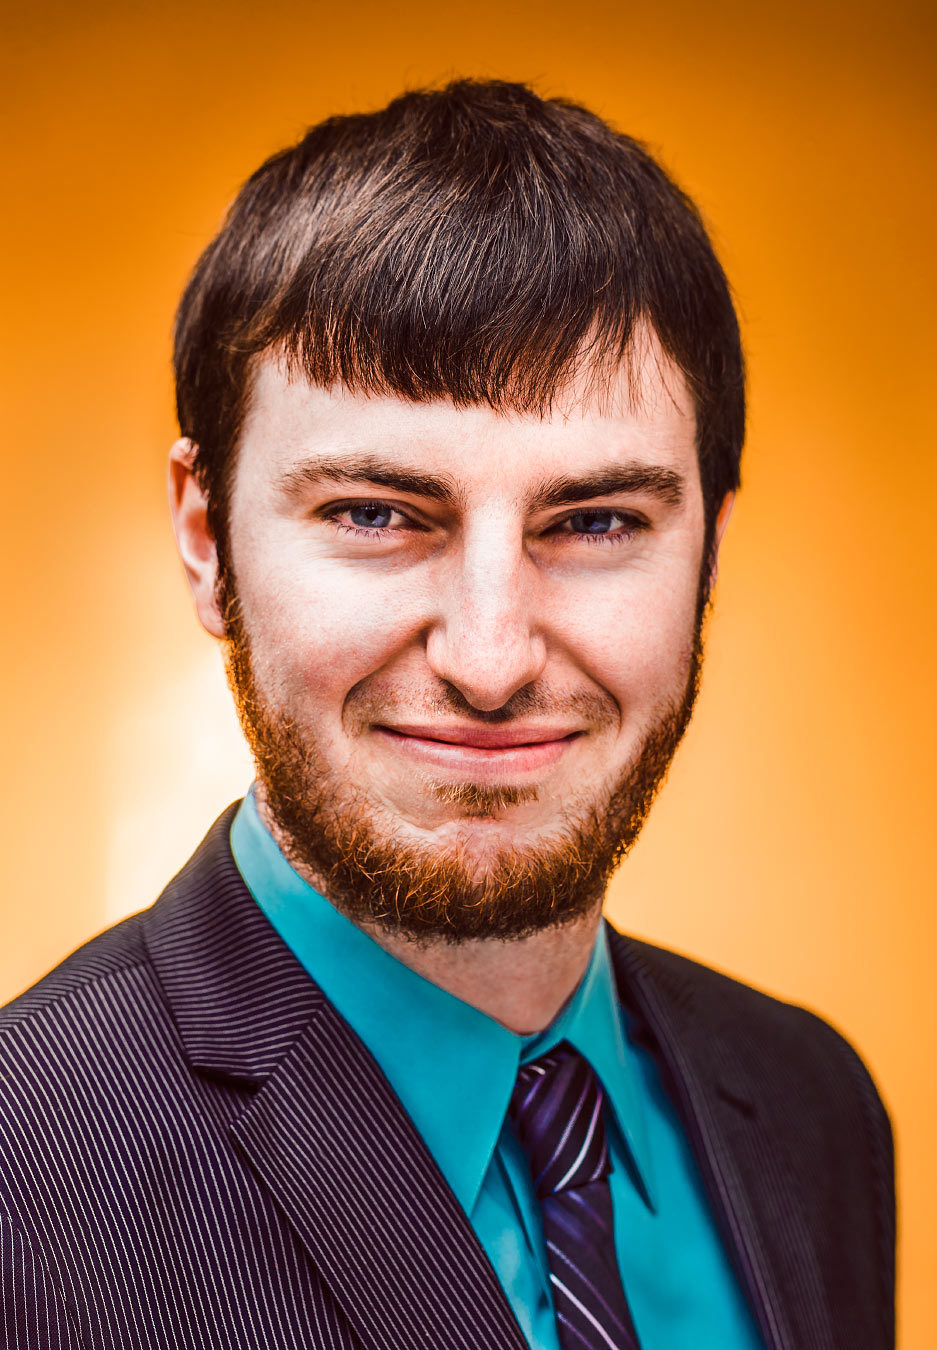 Blake Wilson head shot business portrait California